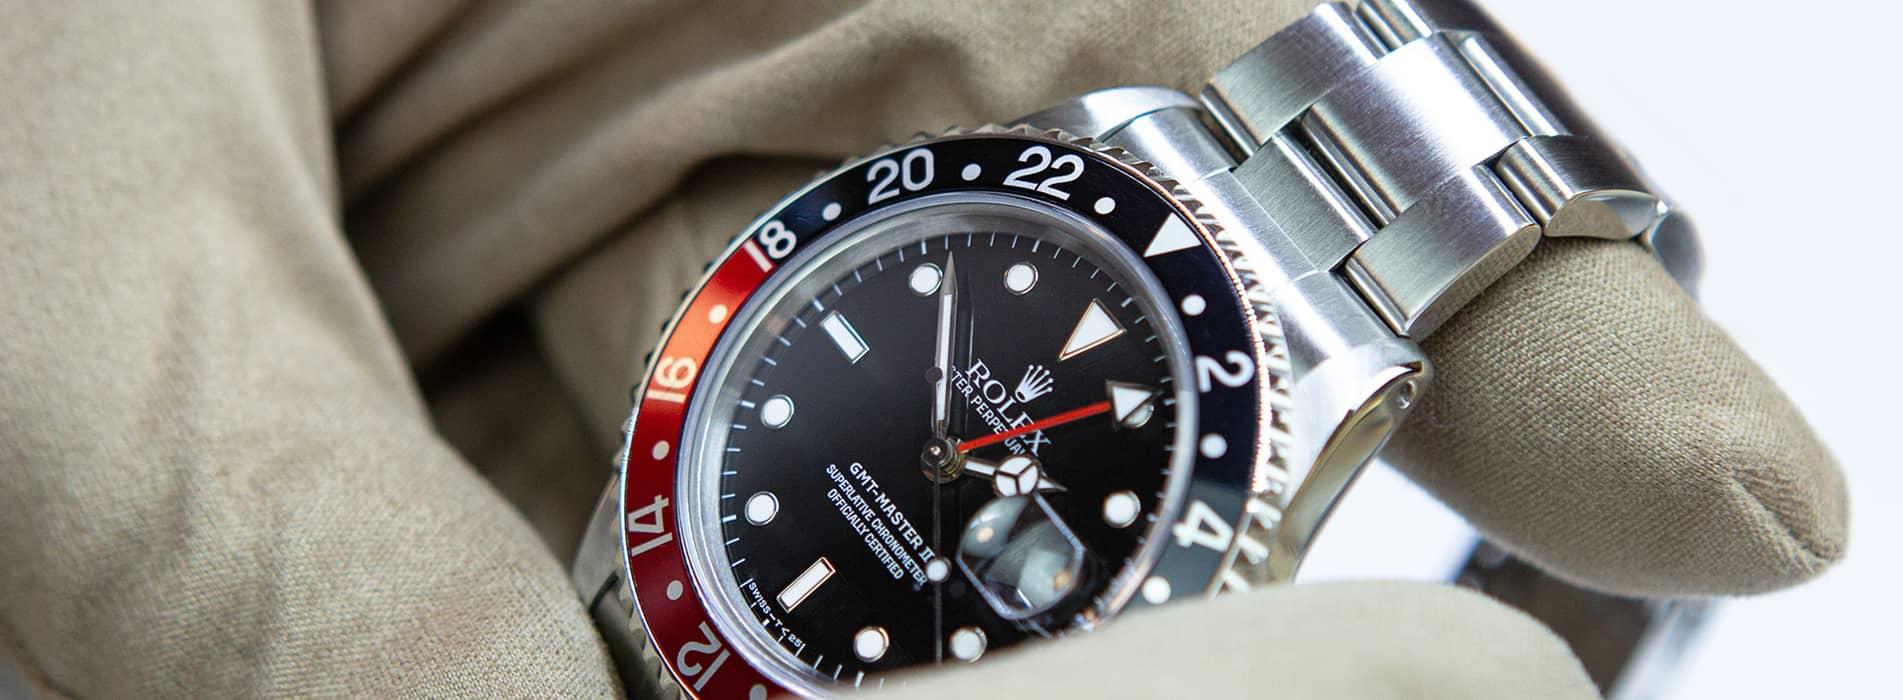 Restore Your Watch